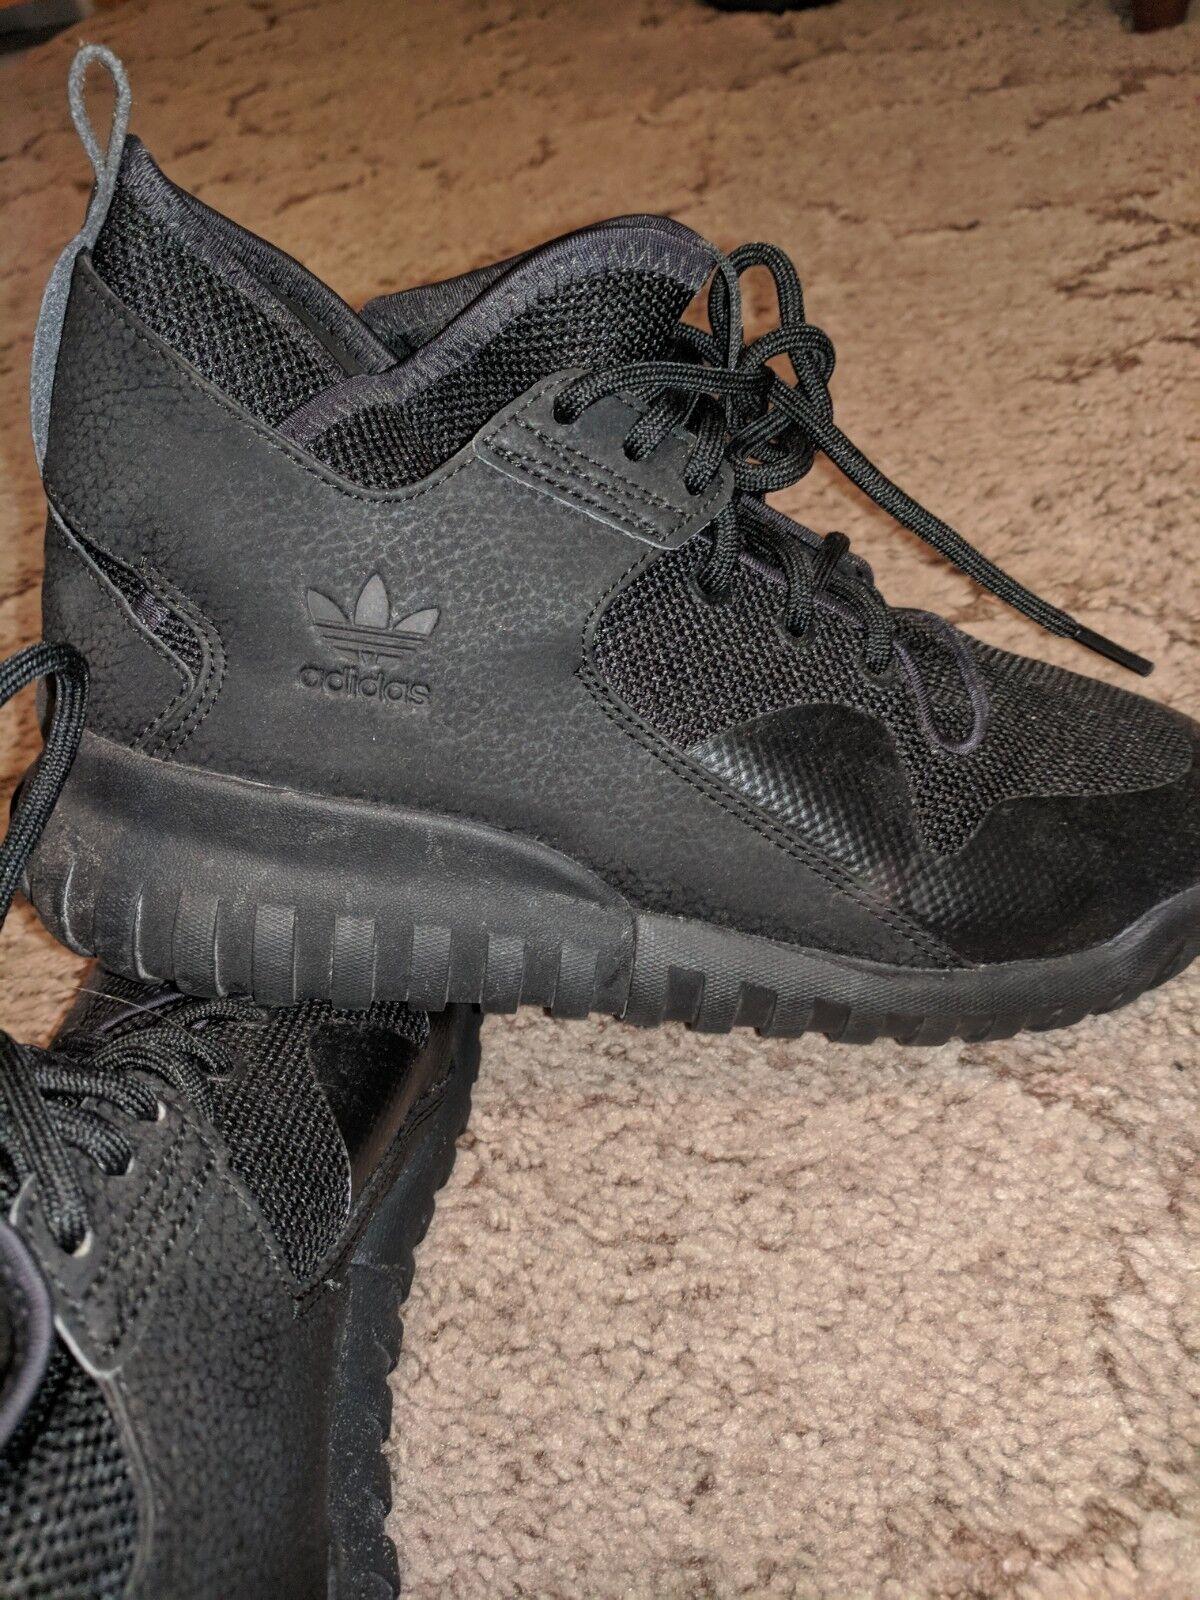 Adidas (x primeknit alphabounce springblade schuhe größe 8